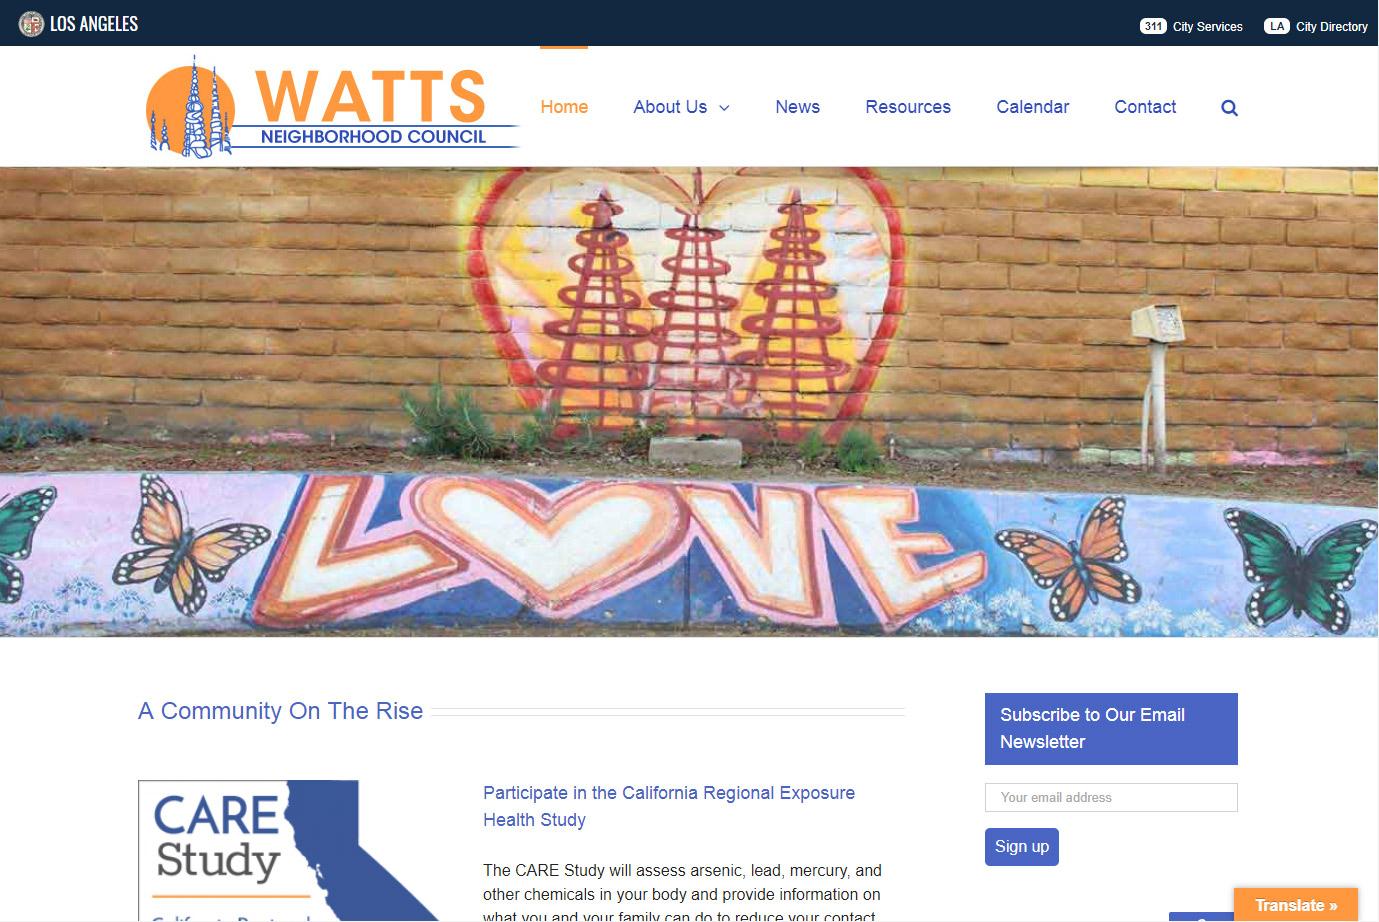 Watts Neighborhood Council site with LOVE mural